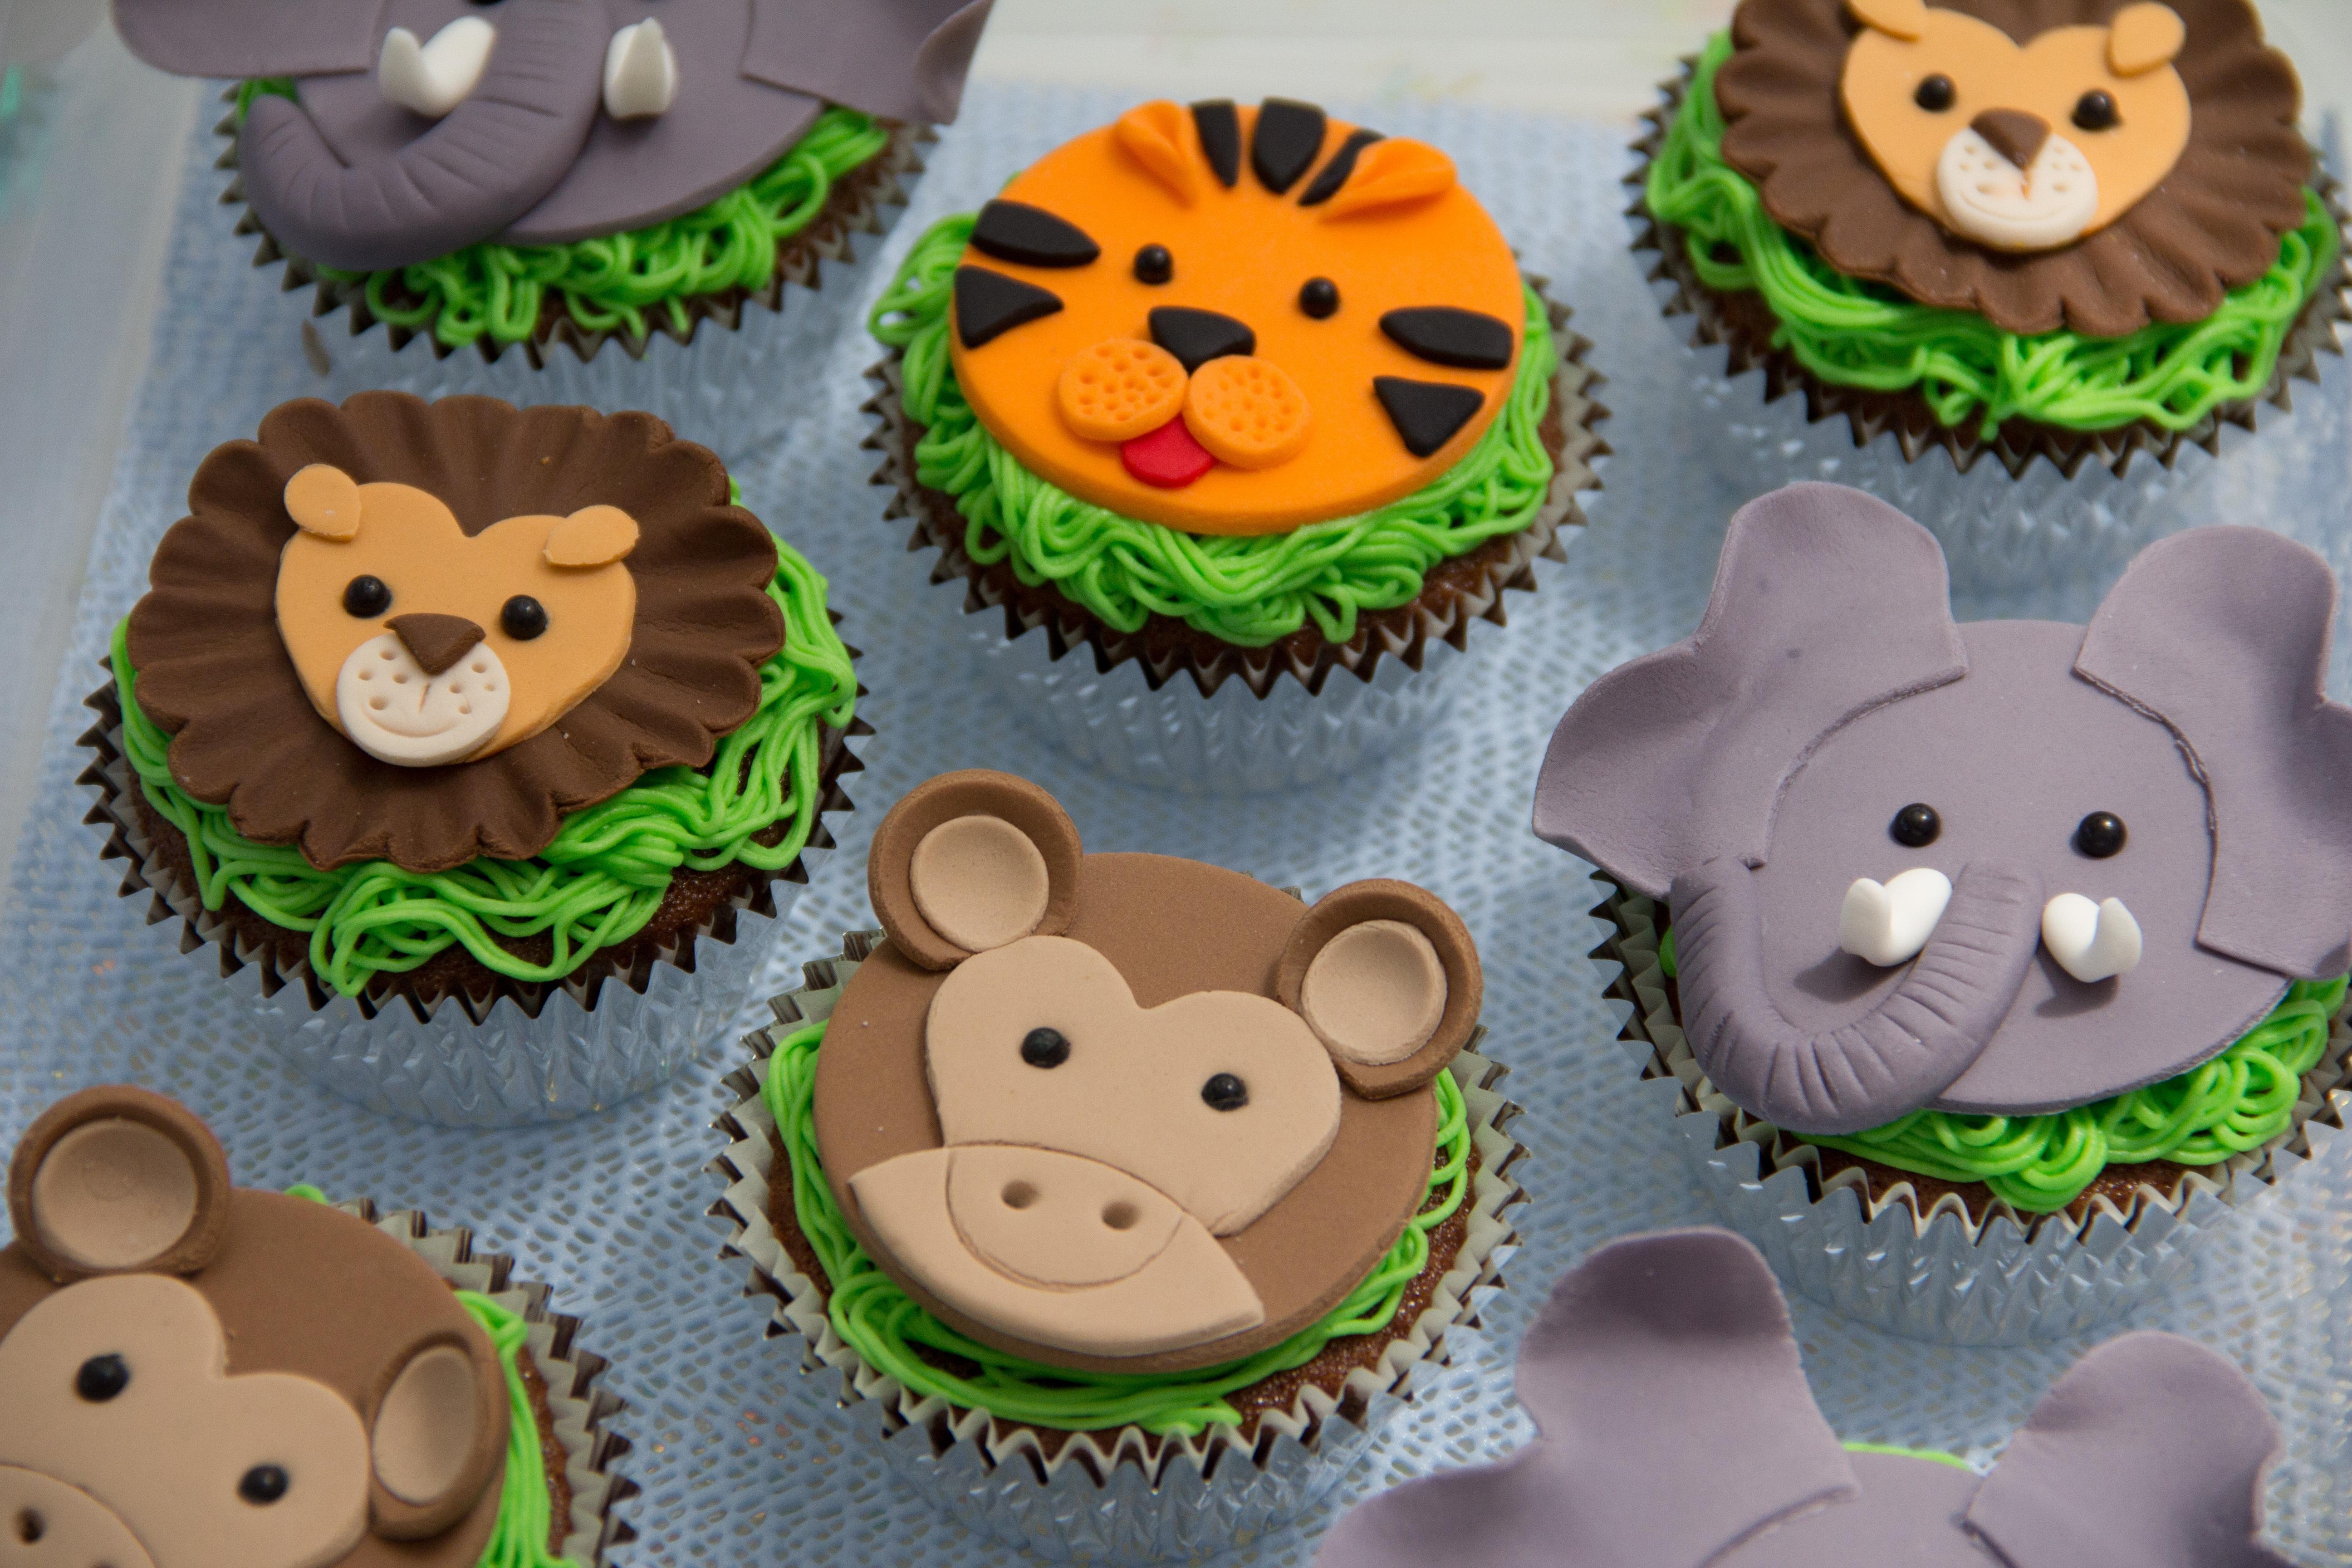 Free Images Celebration Food Cupcake Dessert Monkey